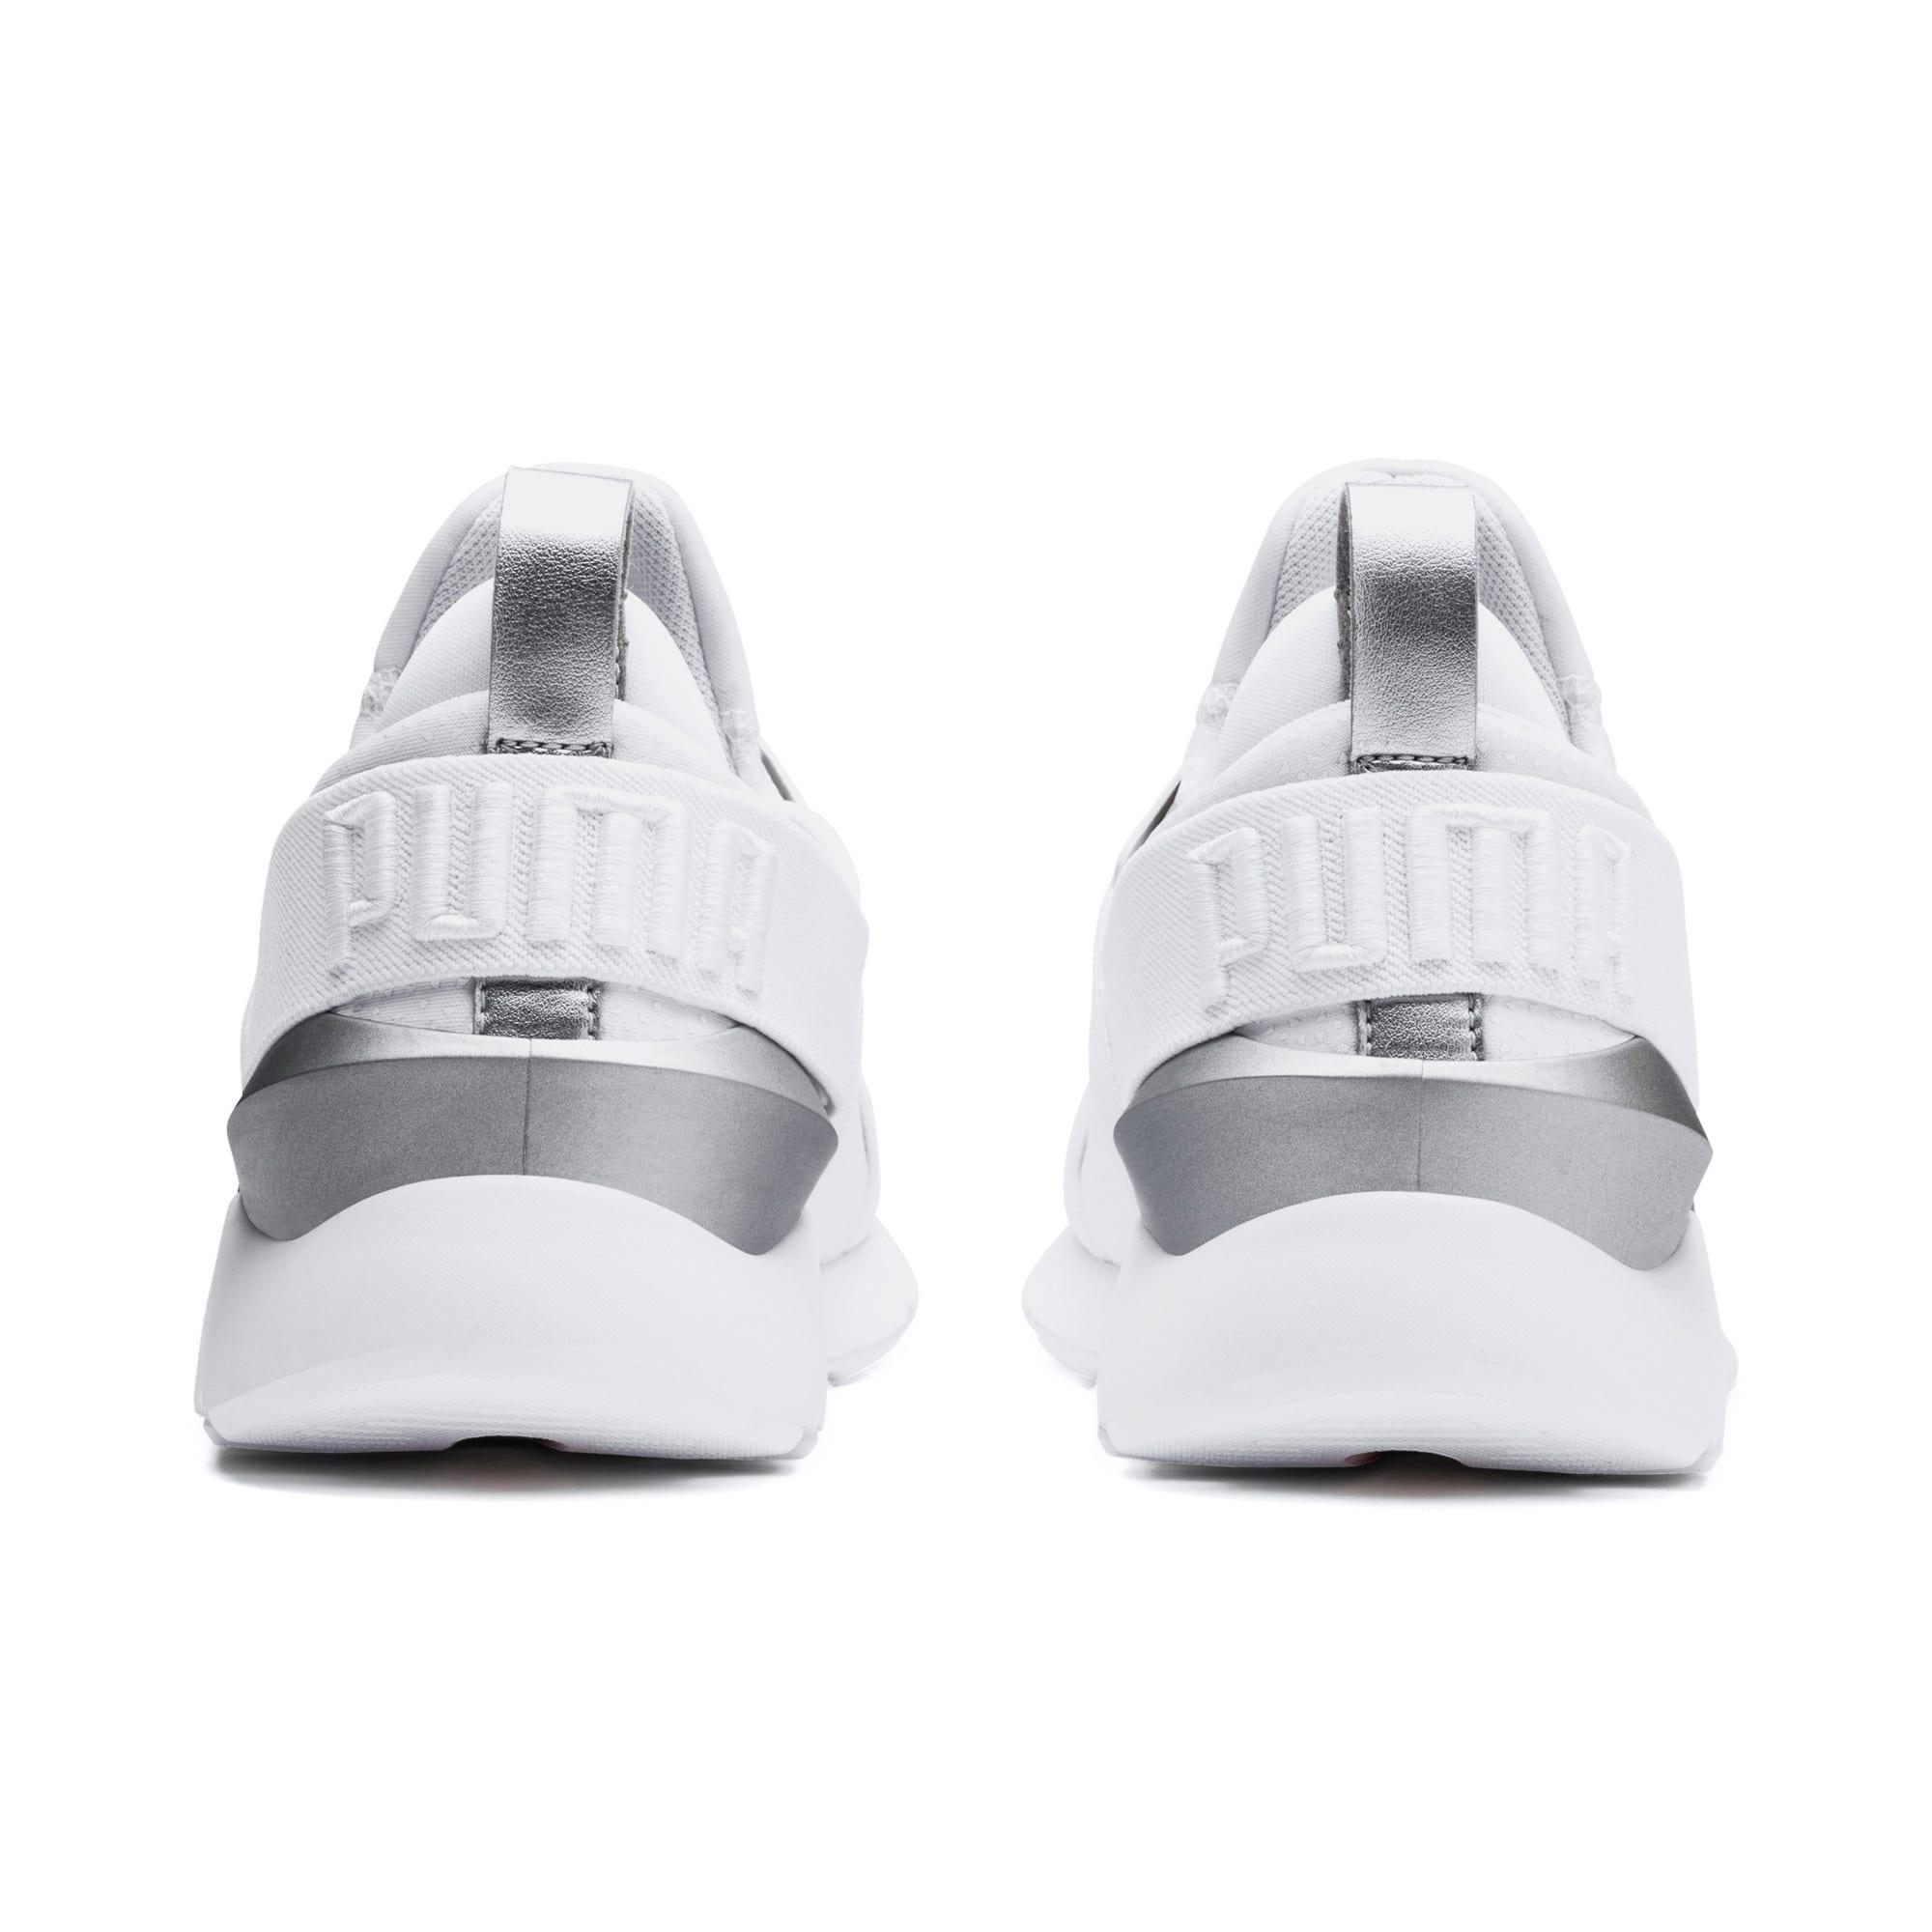 Thumbnail 3 of Muse Perf Women's Sneakers, Puma White-Puma Silver, medium